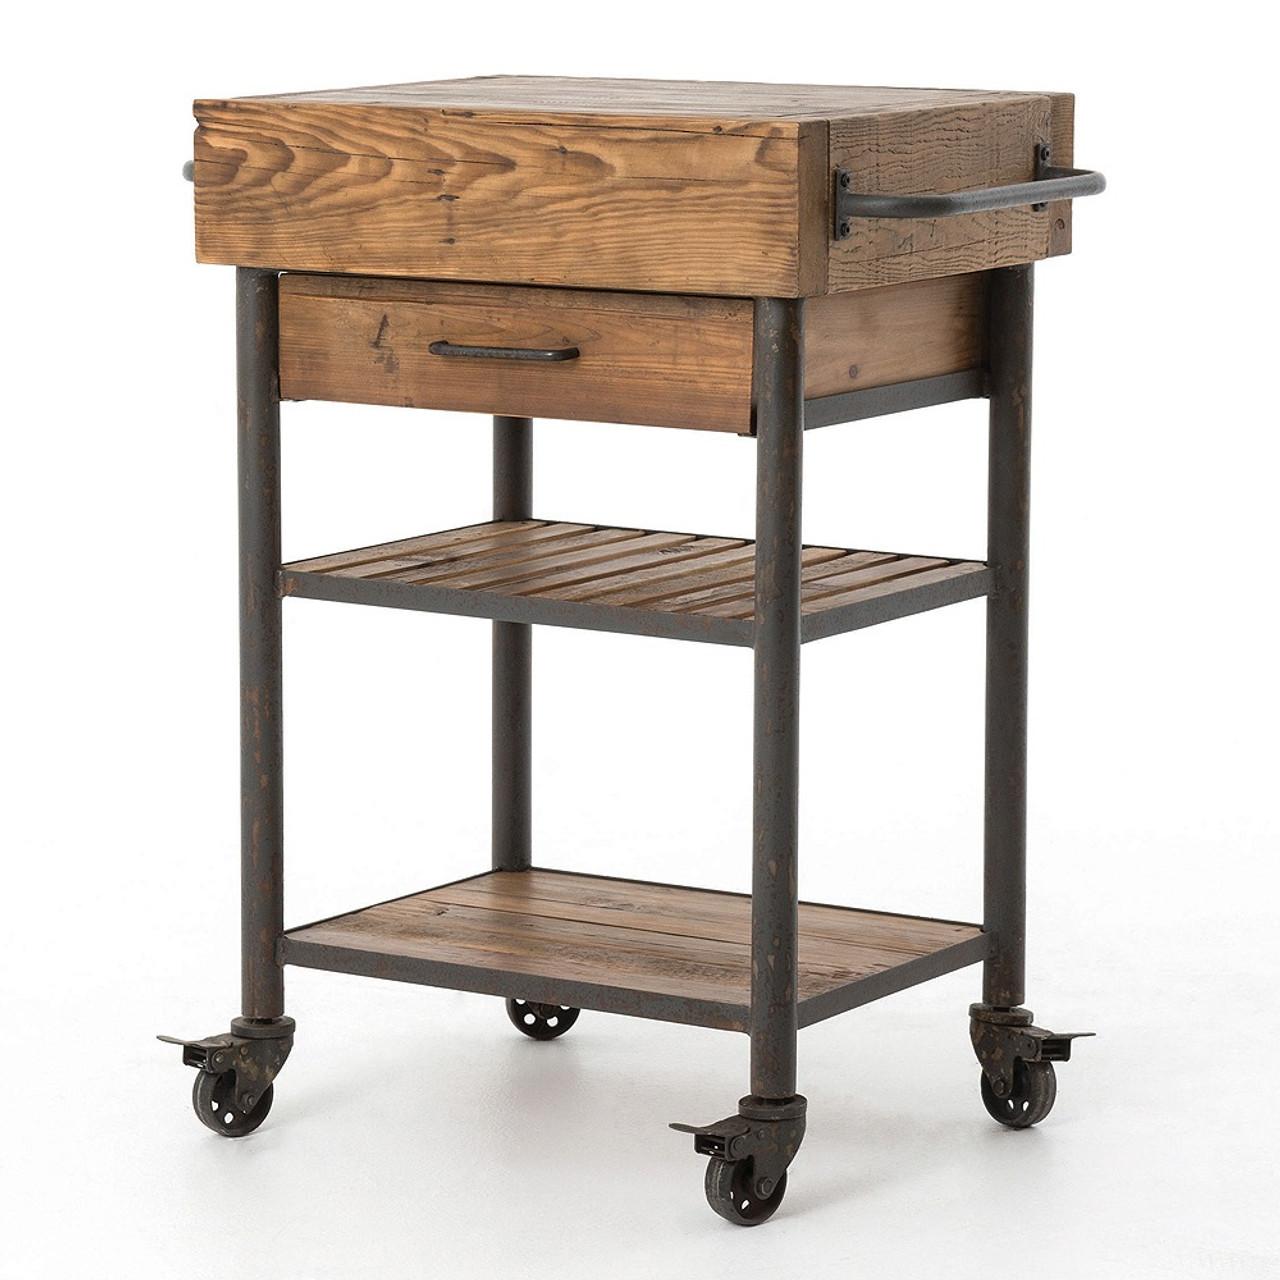 kitchen island cart industrial. Industrial Reclaimed Wood Rolling Kitchen Island Cart C